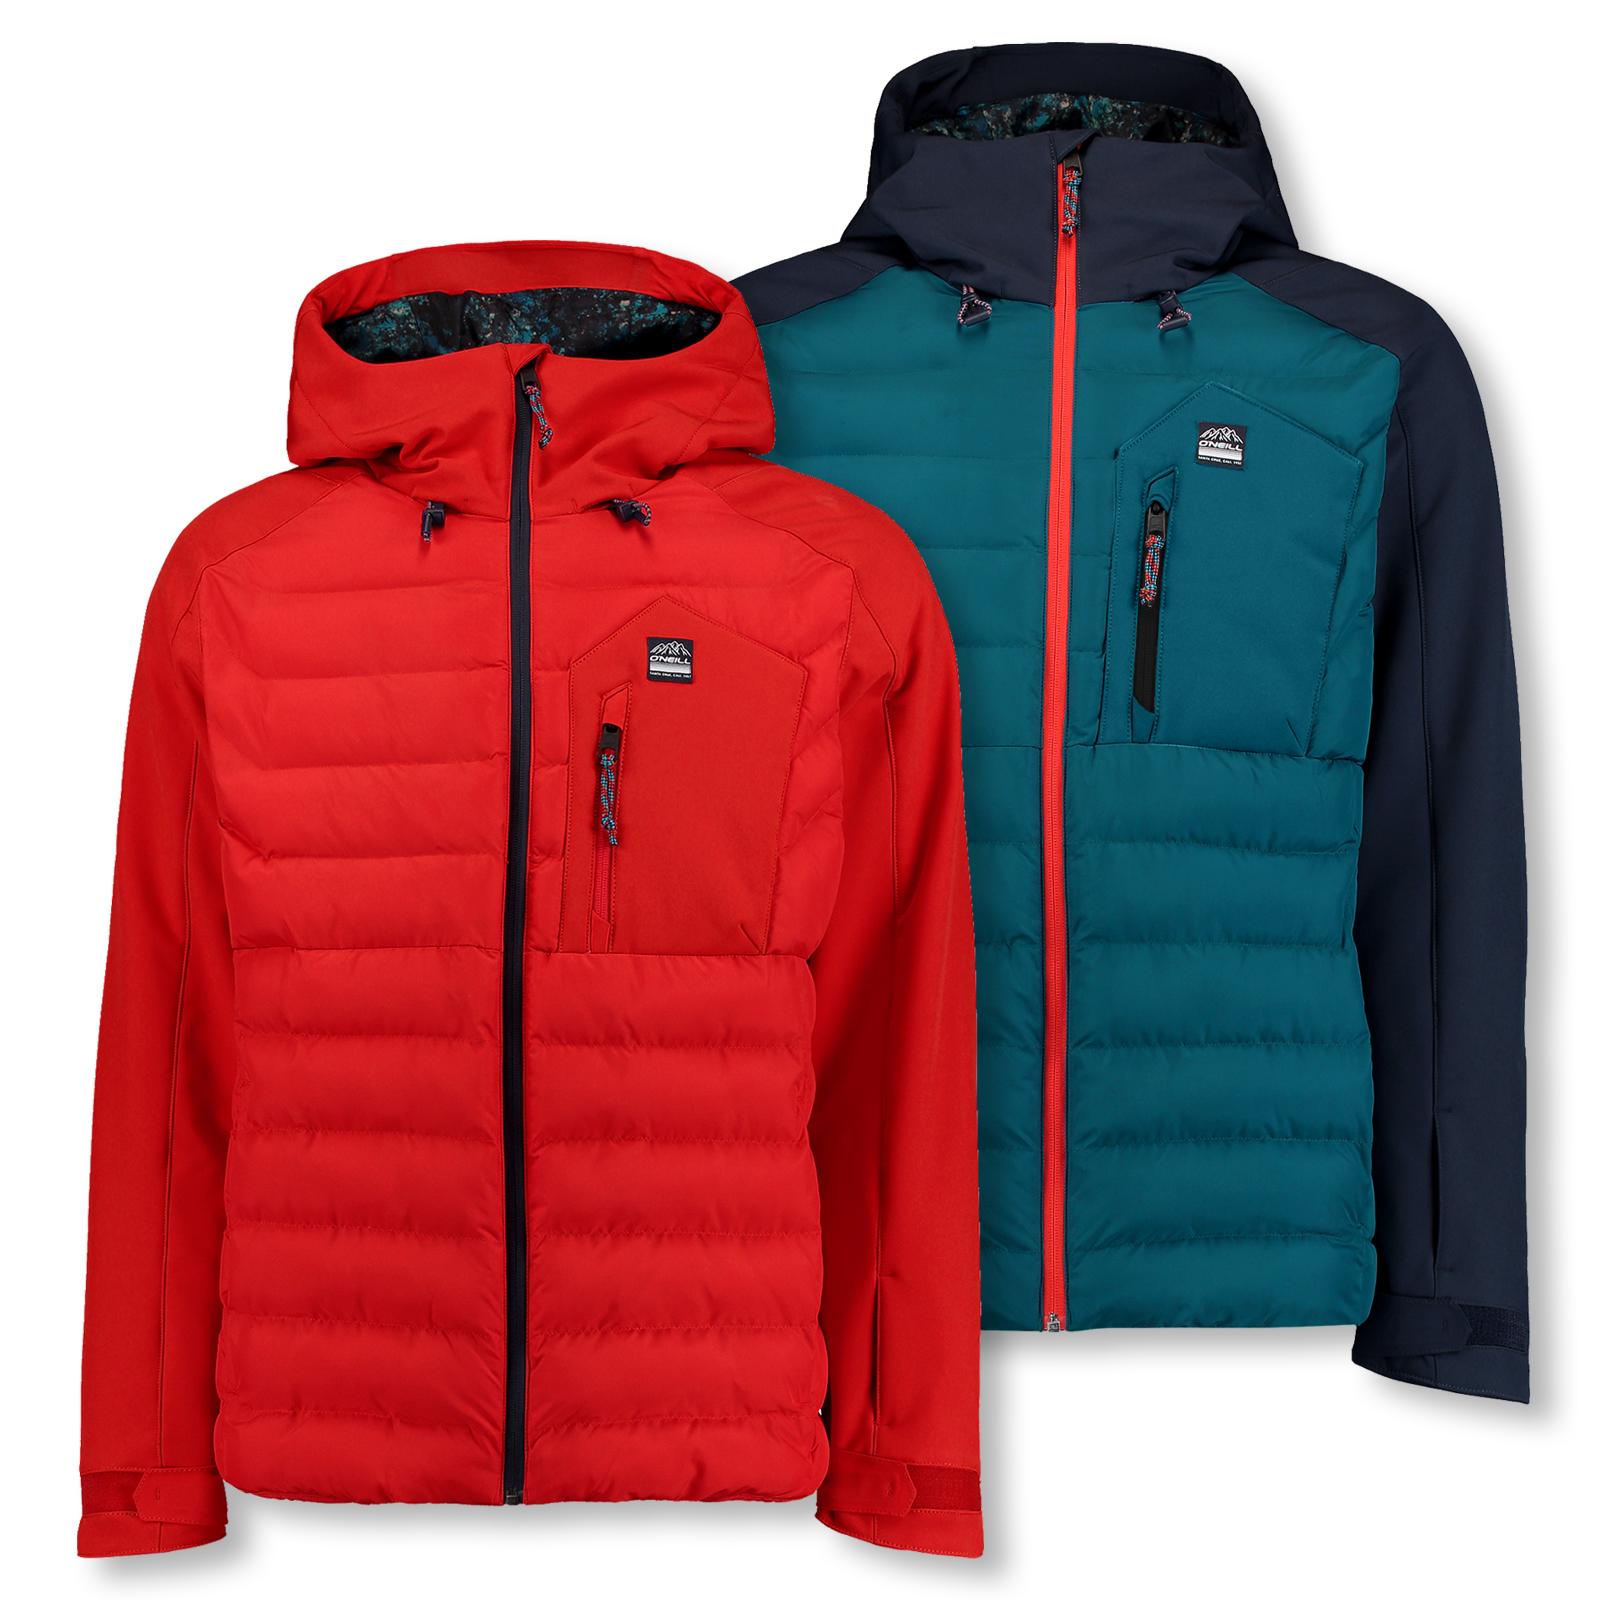 O'NEILL Herren Snowboardjacke Skijacke Kapuze 37-N Jacket M L XL XXL 7P0020 in ink blue